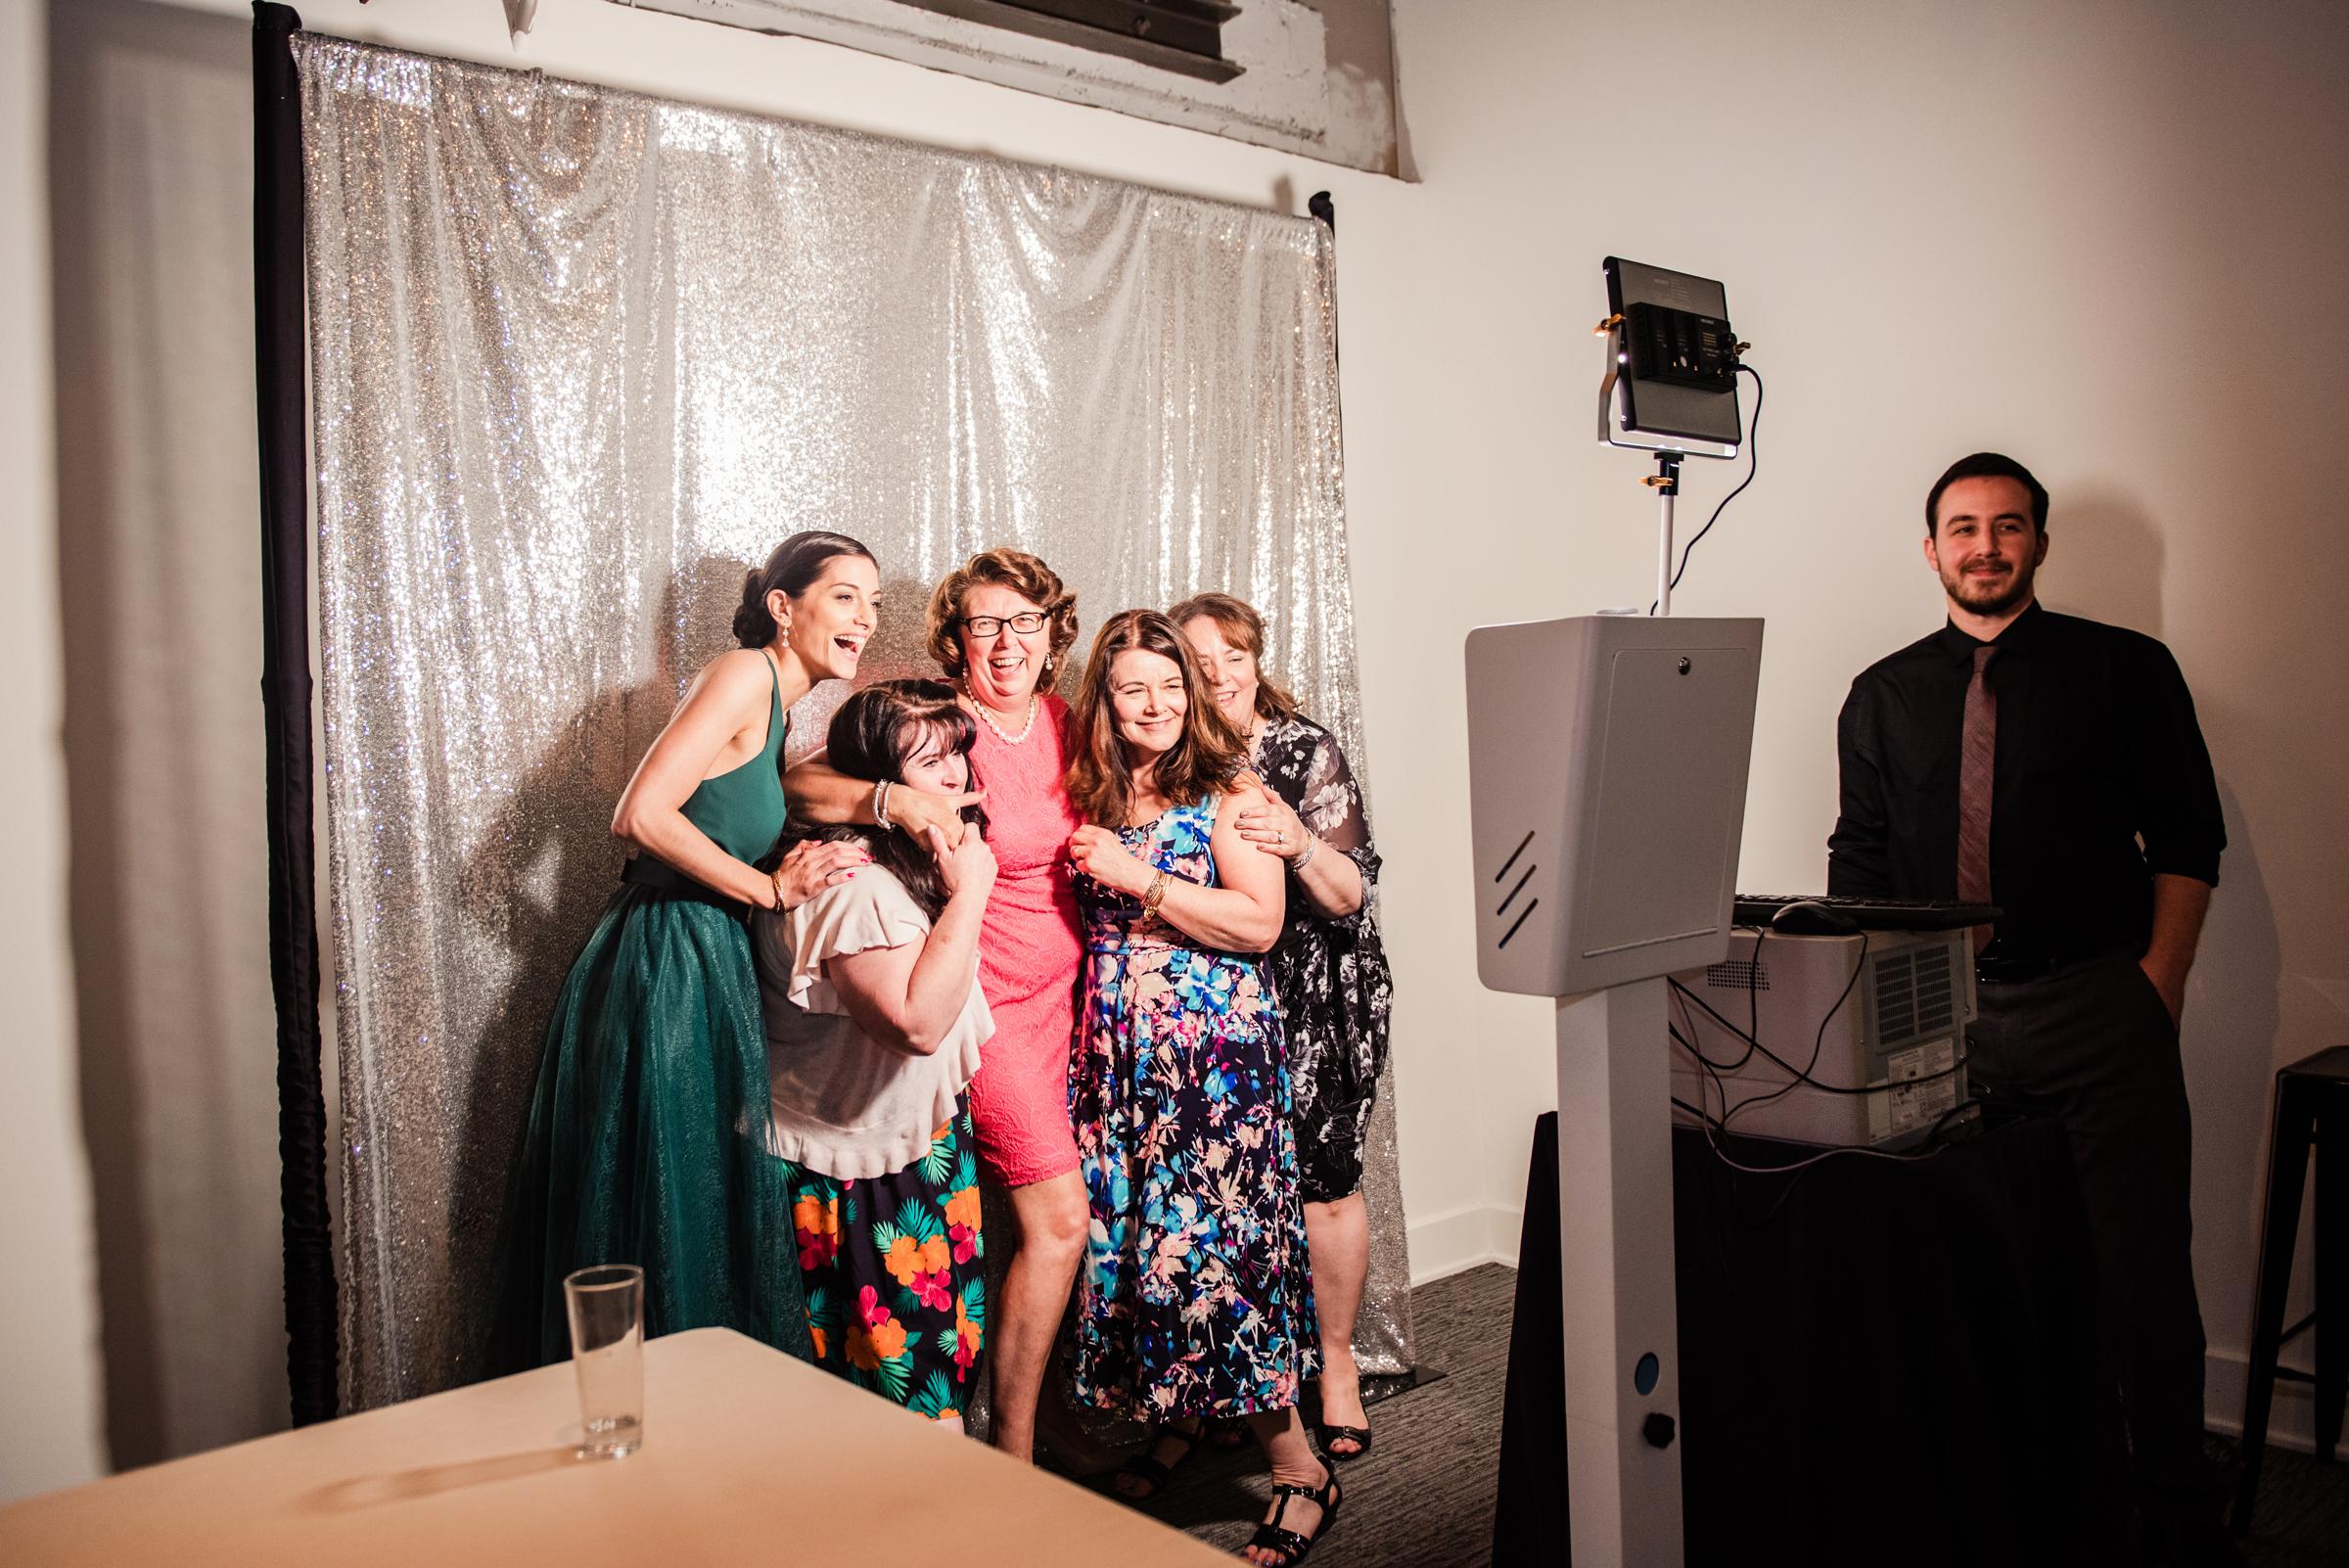 SKY_Armory_Syracuse_Wedding_JILL_STUDIO_Rochester_NY_Photographer_DSC_6041.jpg